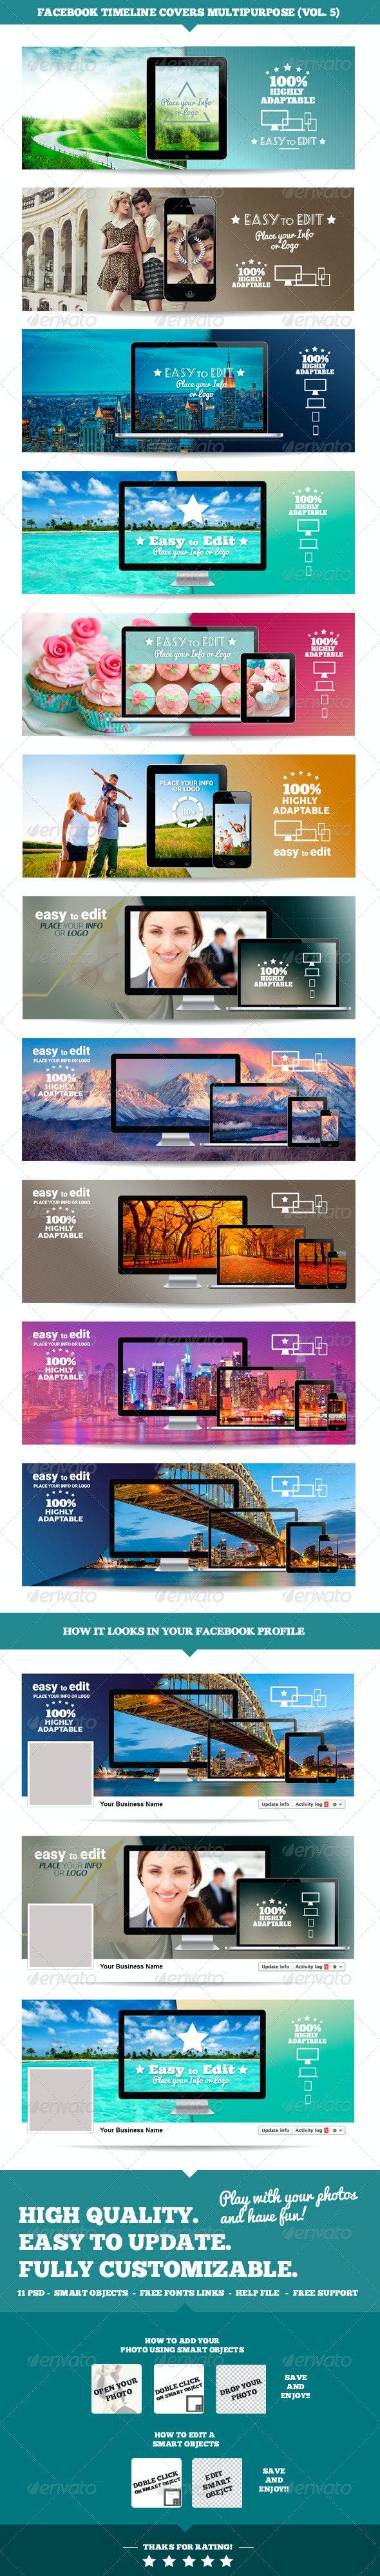 Facebook Timeline Multipurpose Covers Vol.5 - Facebook Timeline Covers Social Media